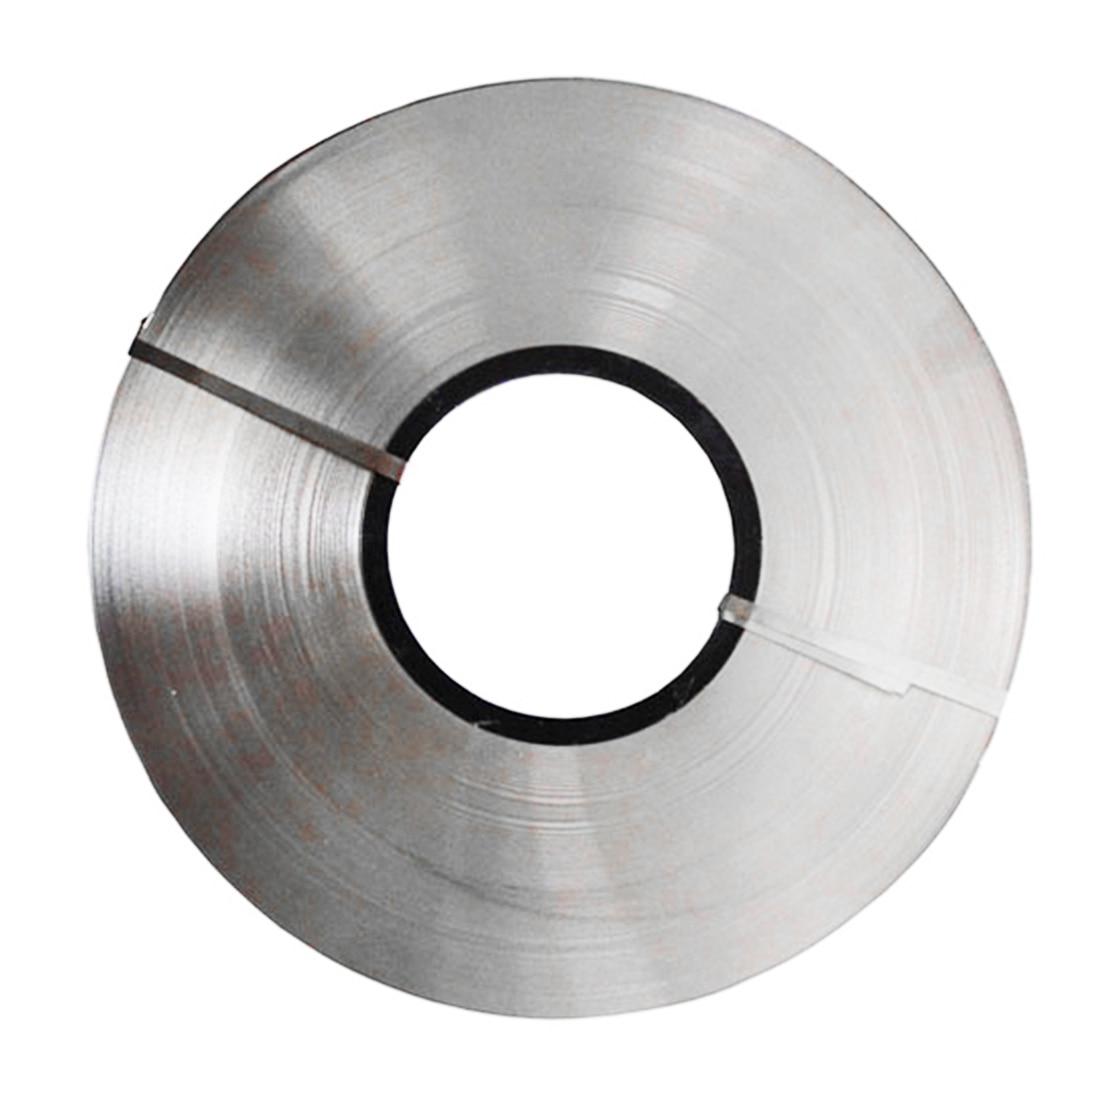 Pure Nickel Strip Tape For Li 18650 Battery Spot Welding Compatible For Spot Welder Machine 0.1 X 5mm 2M